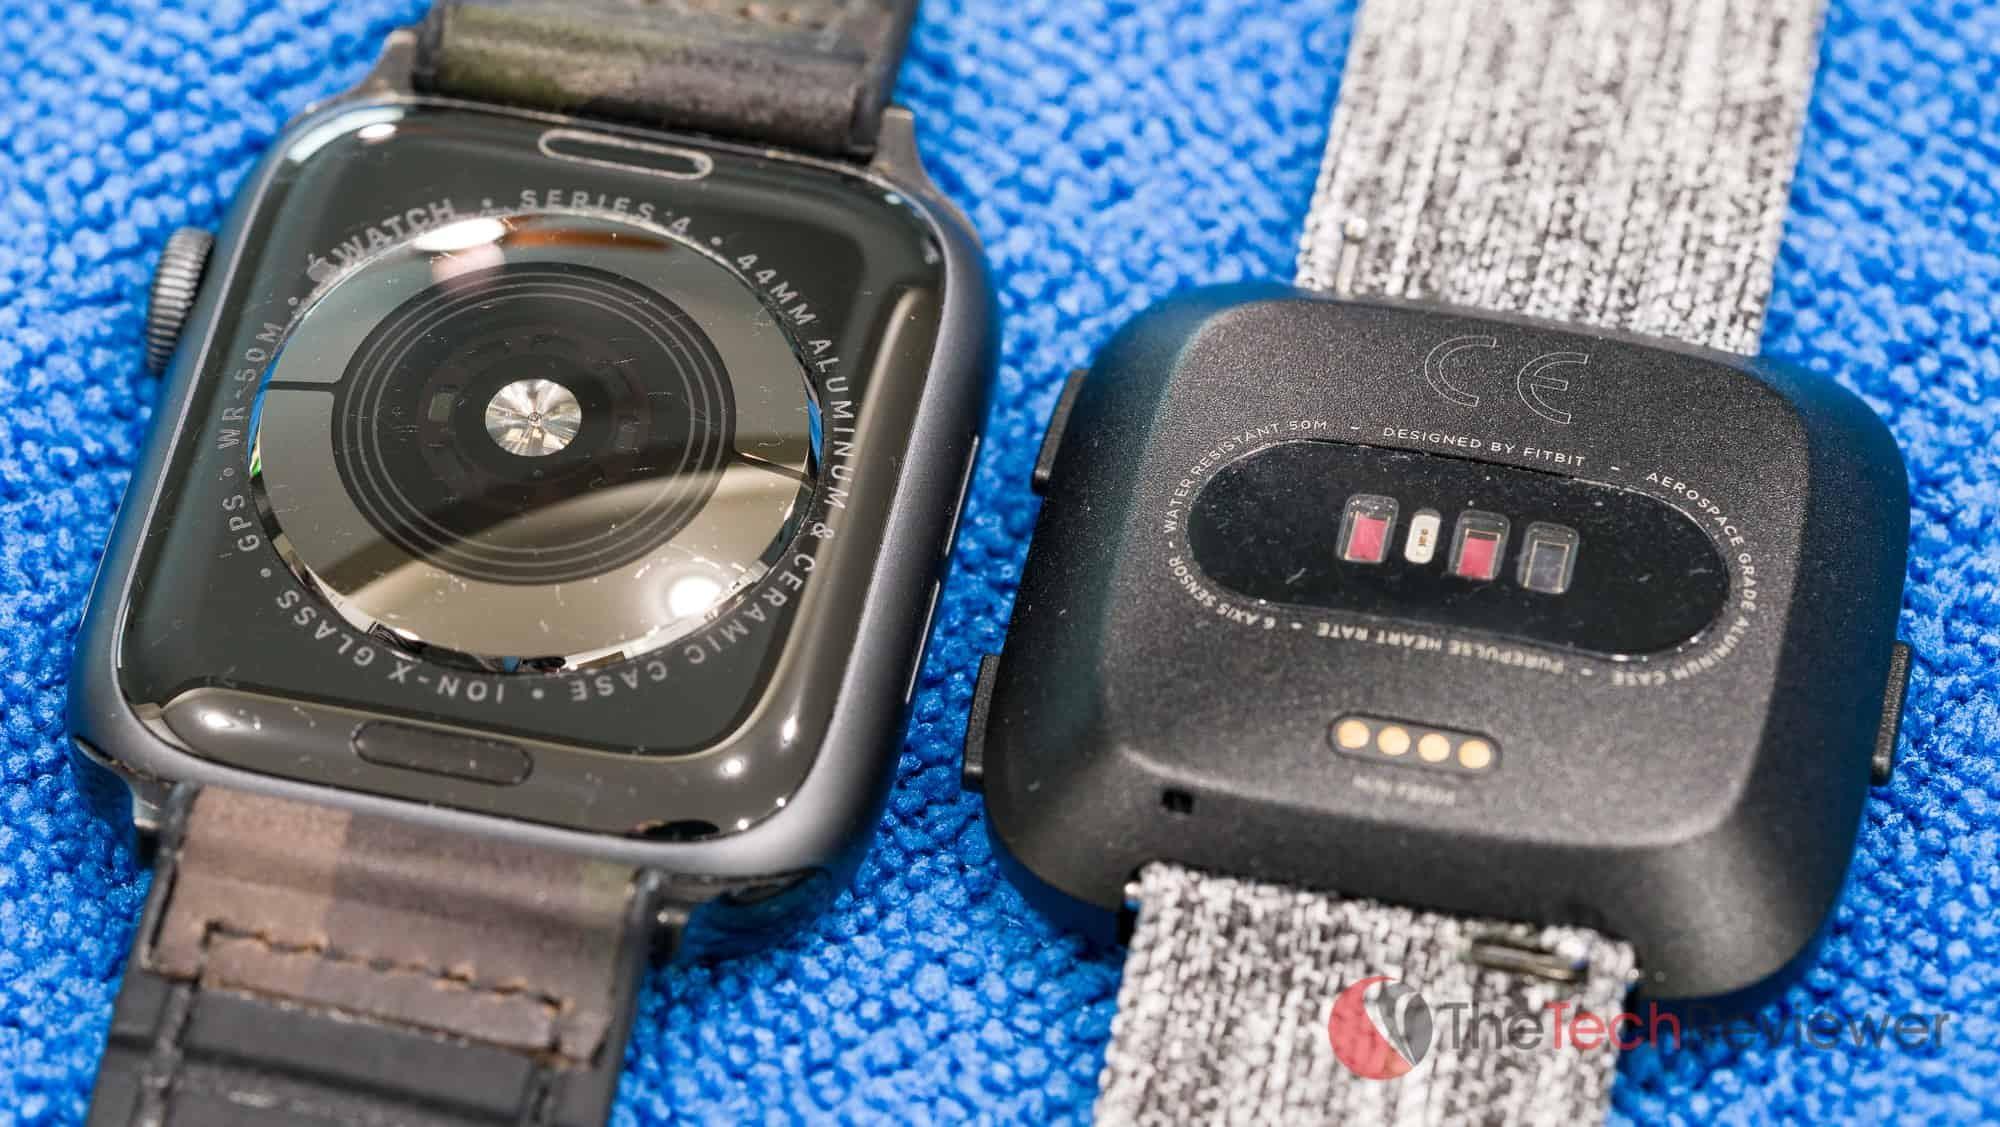 Apple Watch versus Fitbit Versa HR Sensors